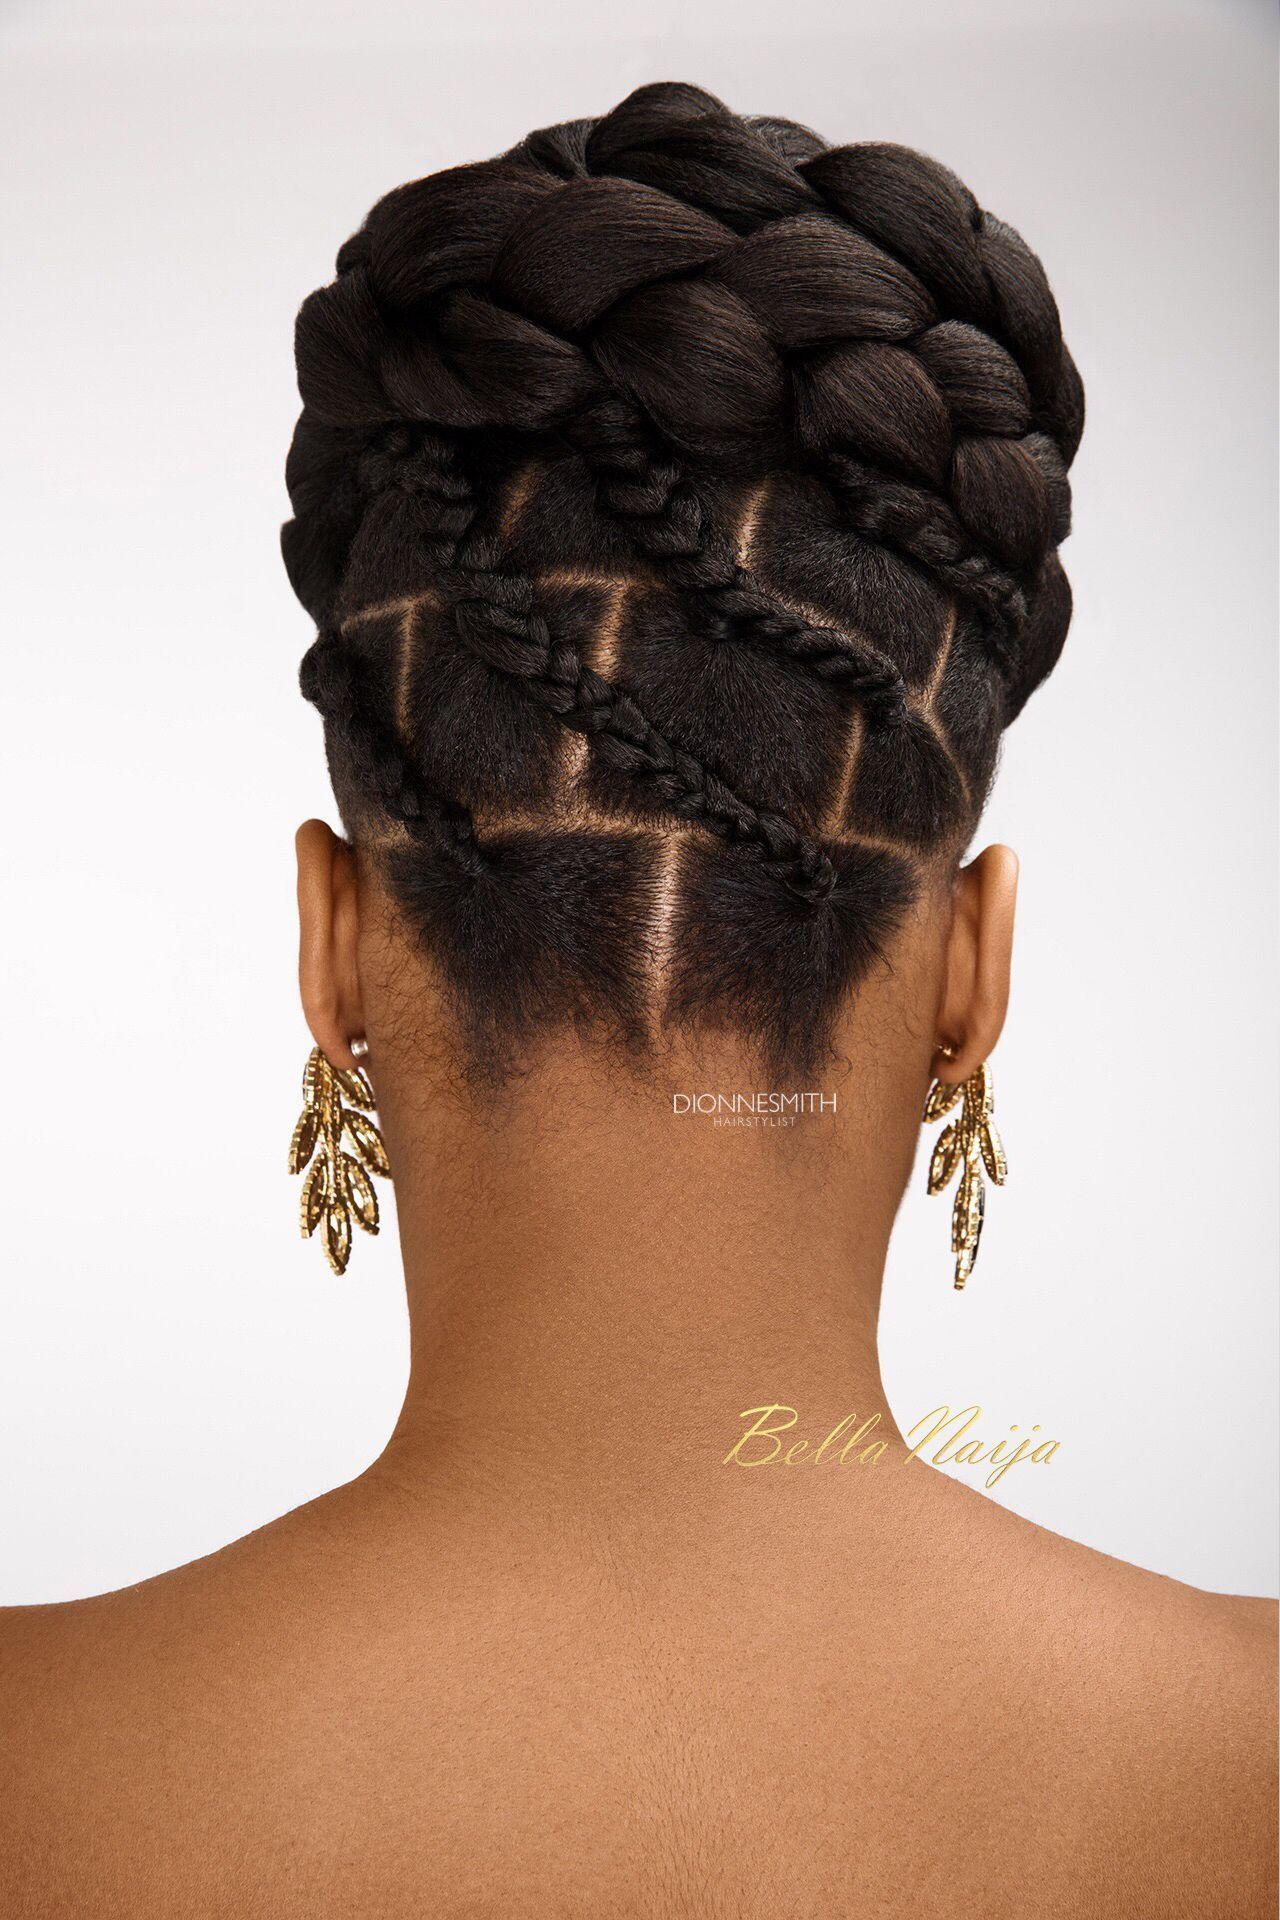 BN Bridal Beauty International Bridal Hair Specialist Dionne Smith presents Elegant Evening